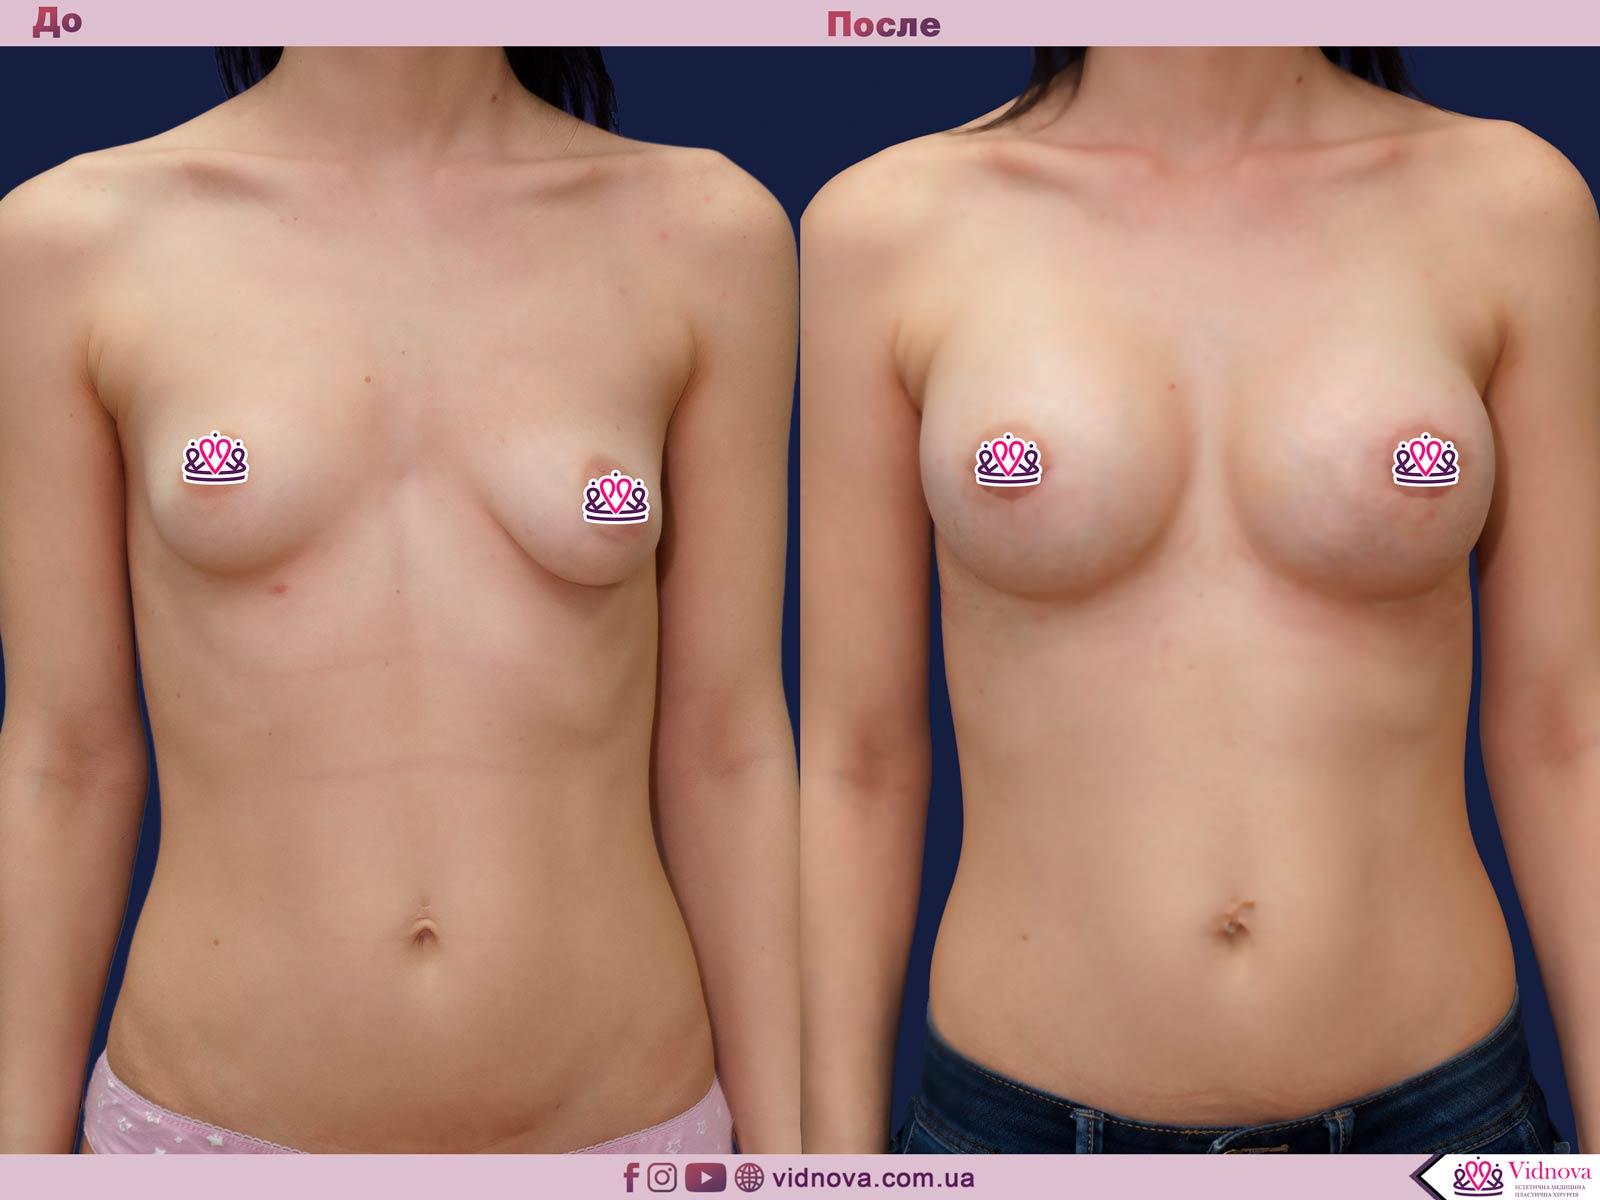 Коррекция асимметрии груди 1 35